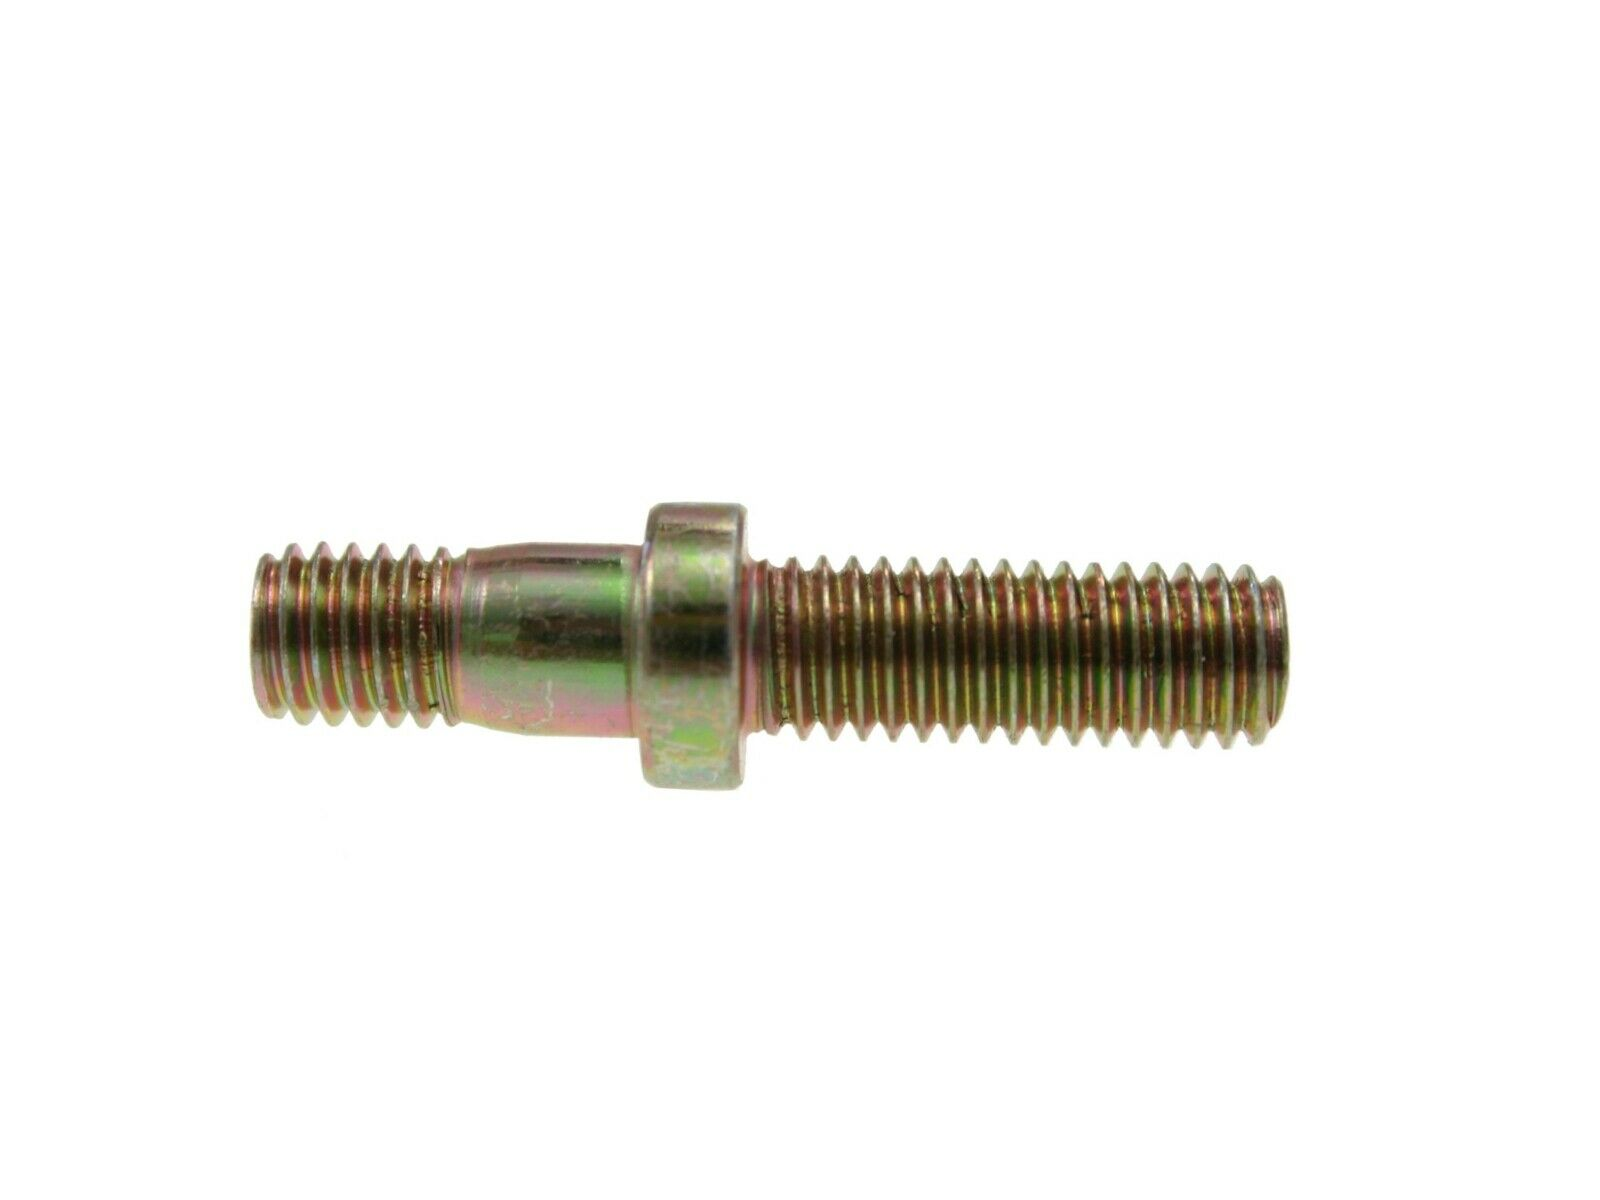 Stehbolzen f Kettenraddeckel für Stihl 045 056 AV 045AV